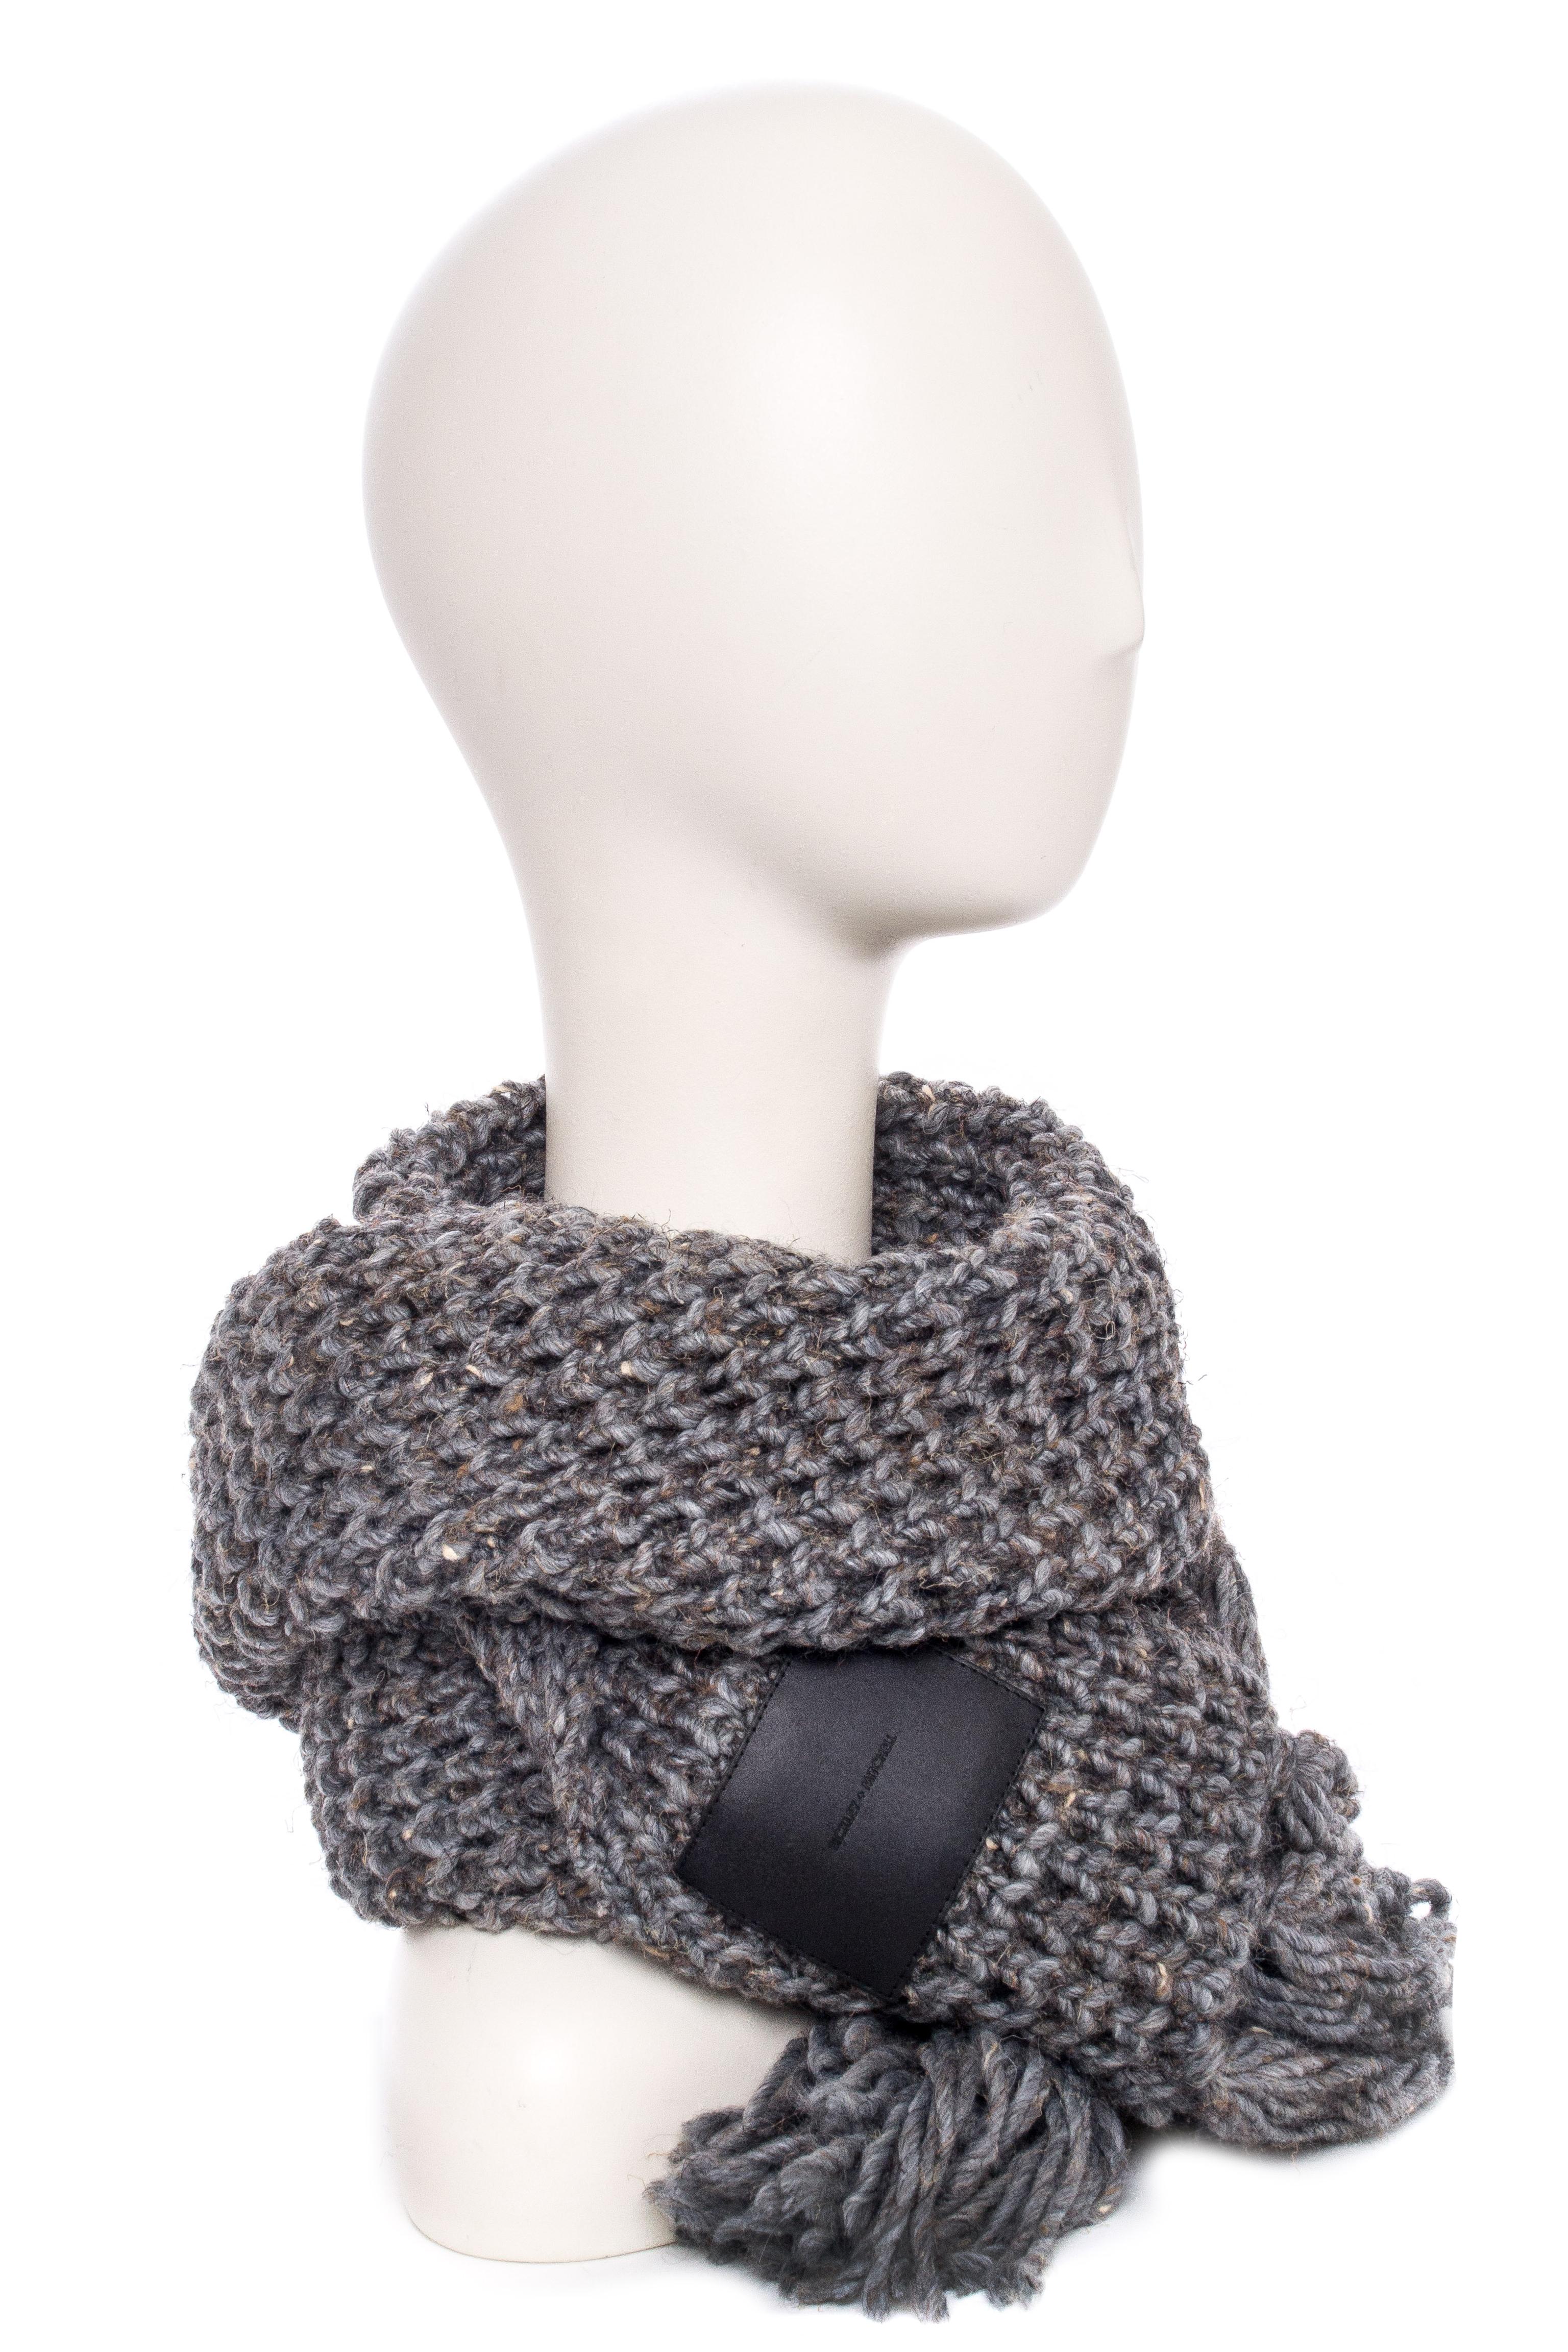 BICKLEY + MITCHELL Warm Multi-Toned Knit Scarf - Grey